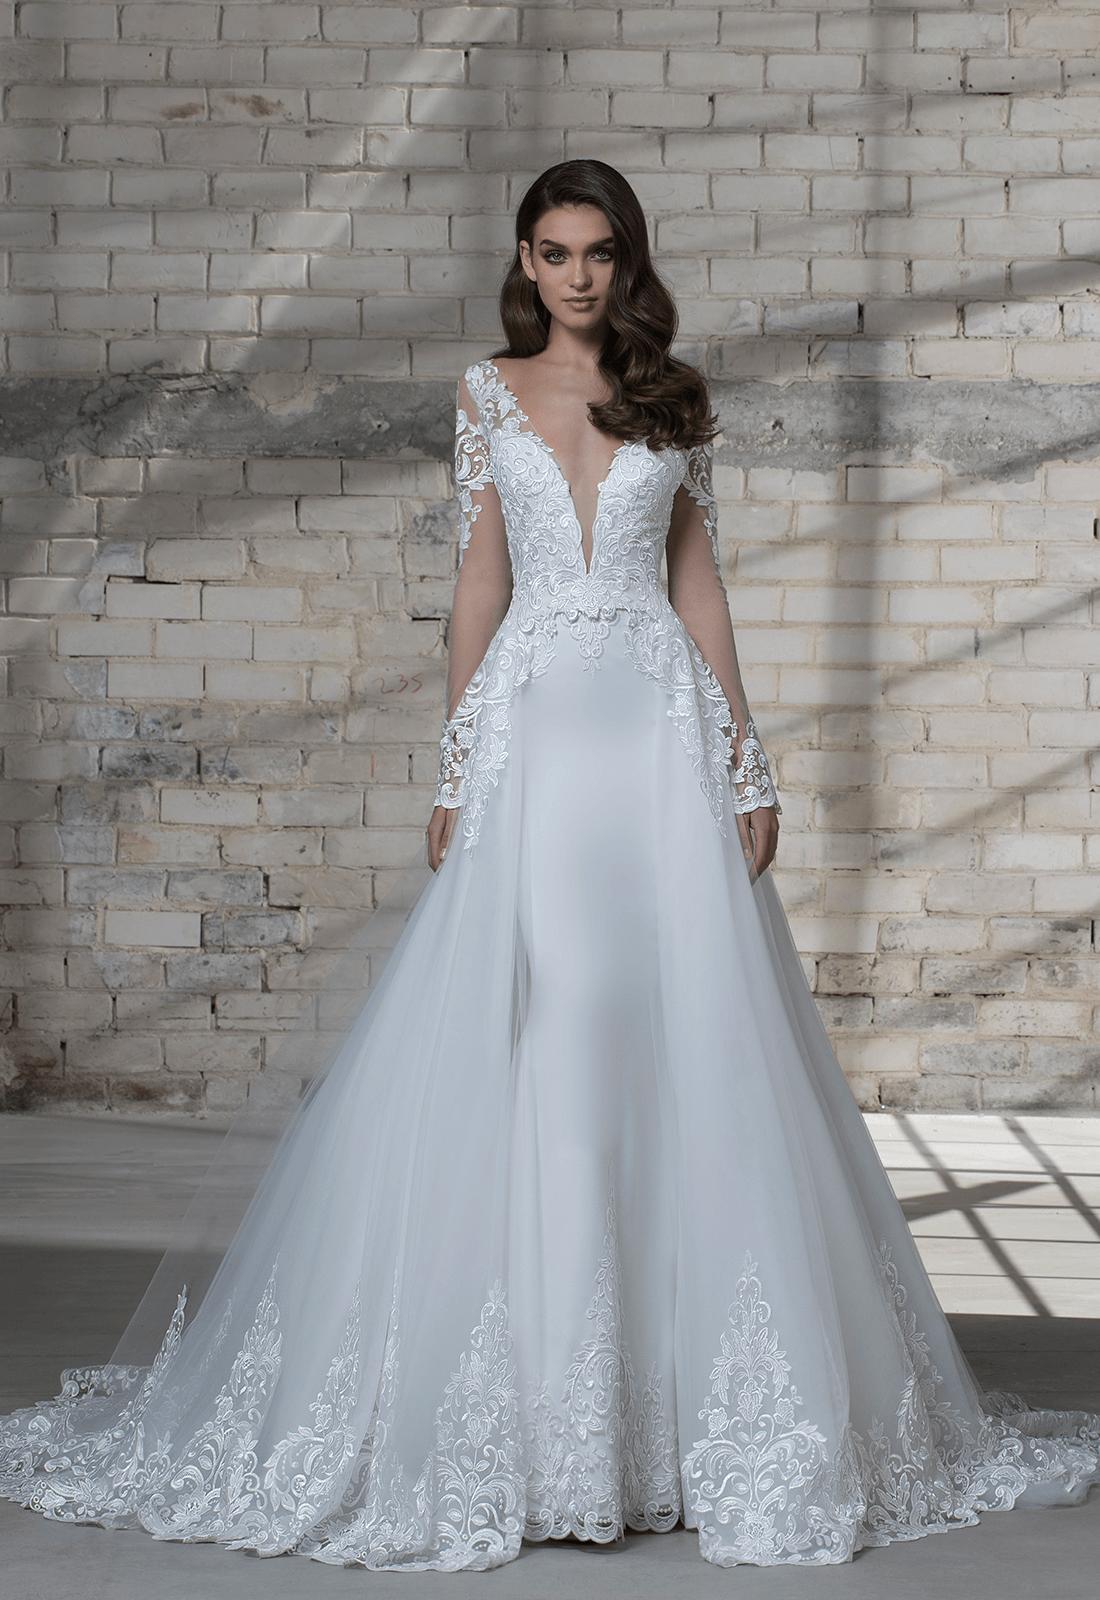 STYLE NO. 14673 DETACHABLE SKIRT | Wedding dresses | Pinterest ...